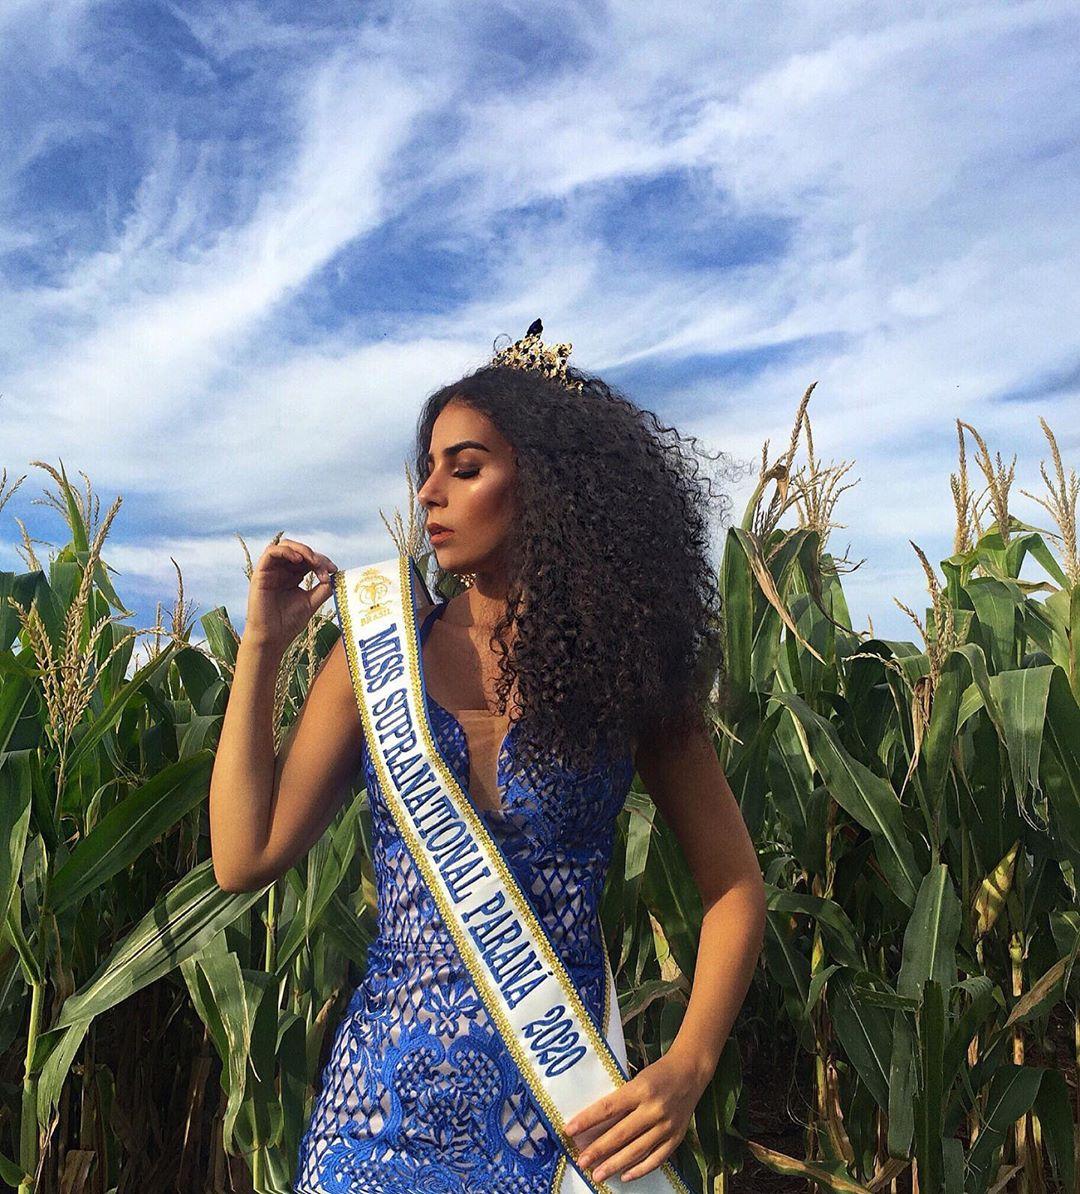 lua paschoalino, miss supranational parana 2020. 10443110